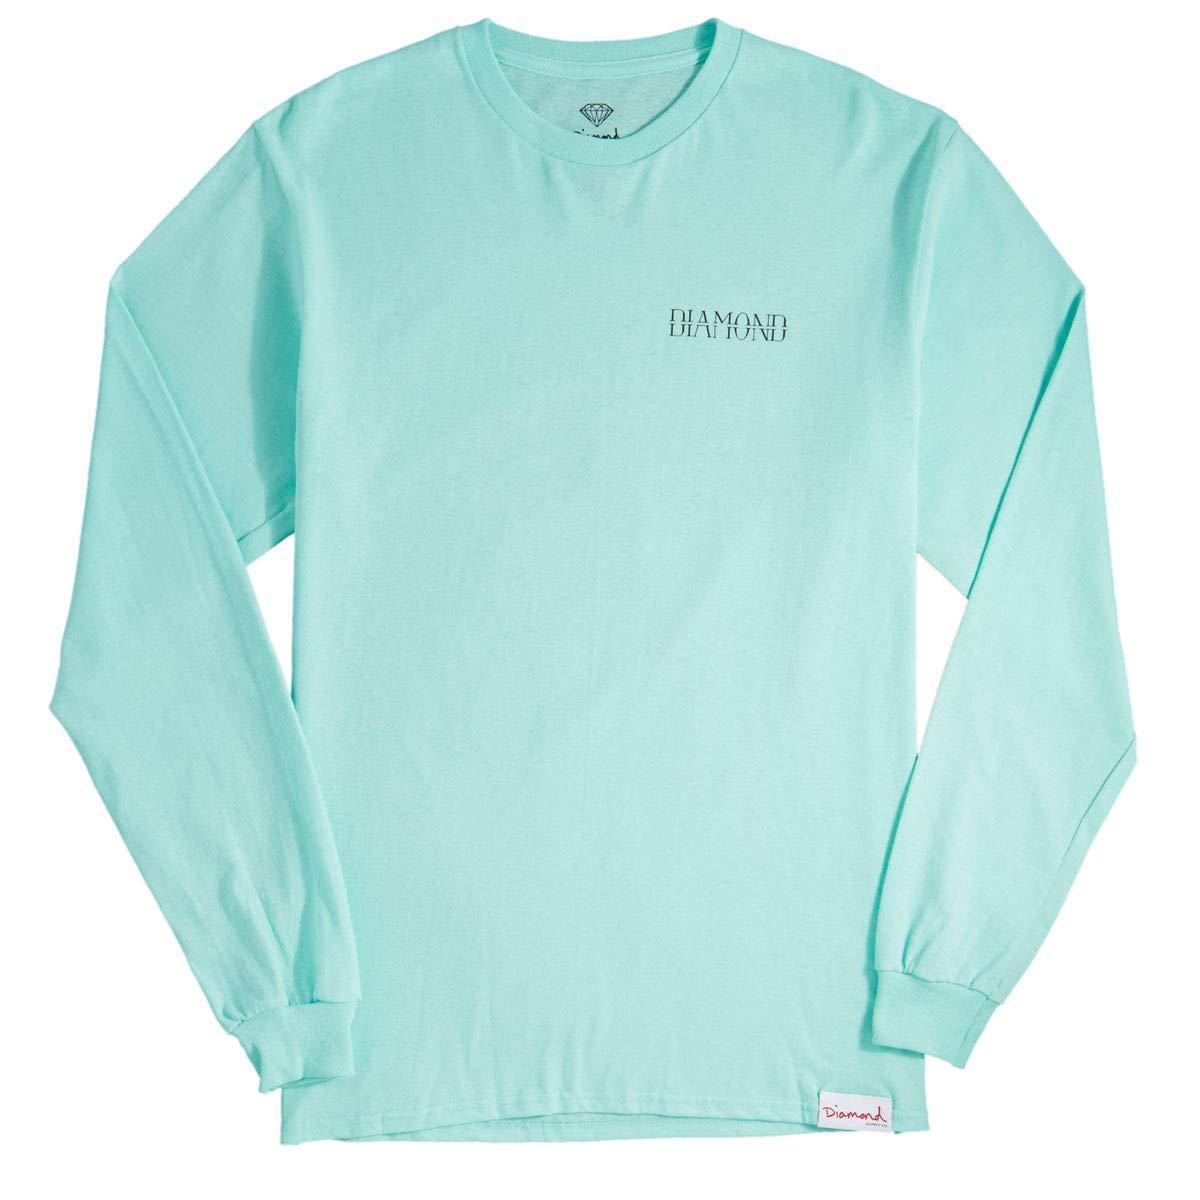 d71bdc5dac1c Get Quotations · Diamond Supply Co. Split Long Sleeve T-Shirt - Diamond Blue